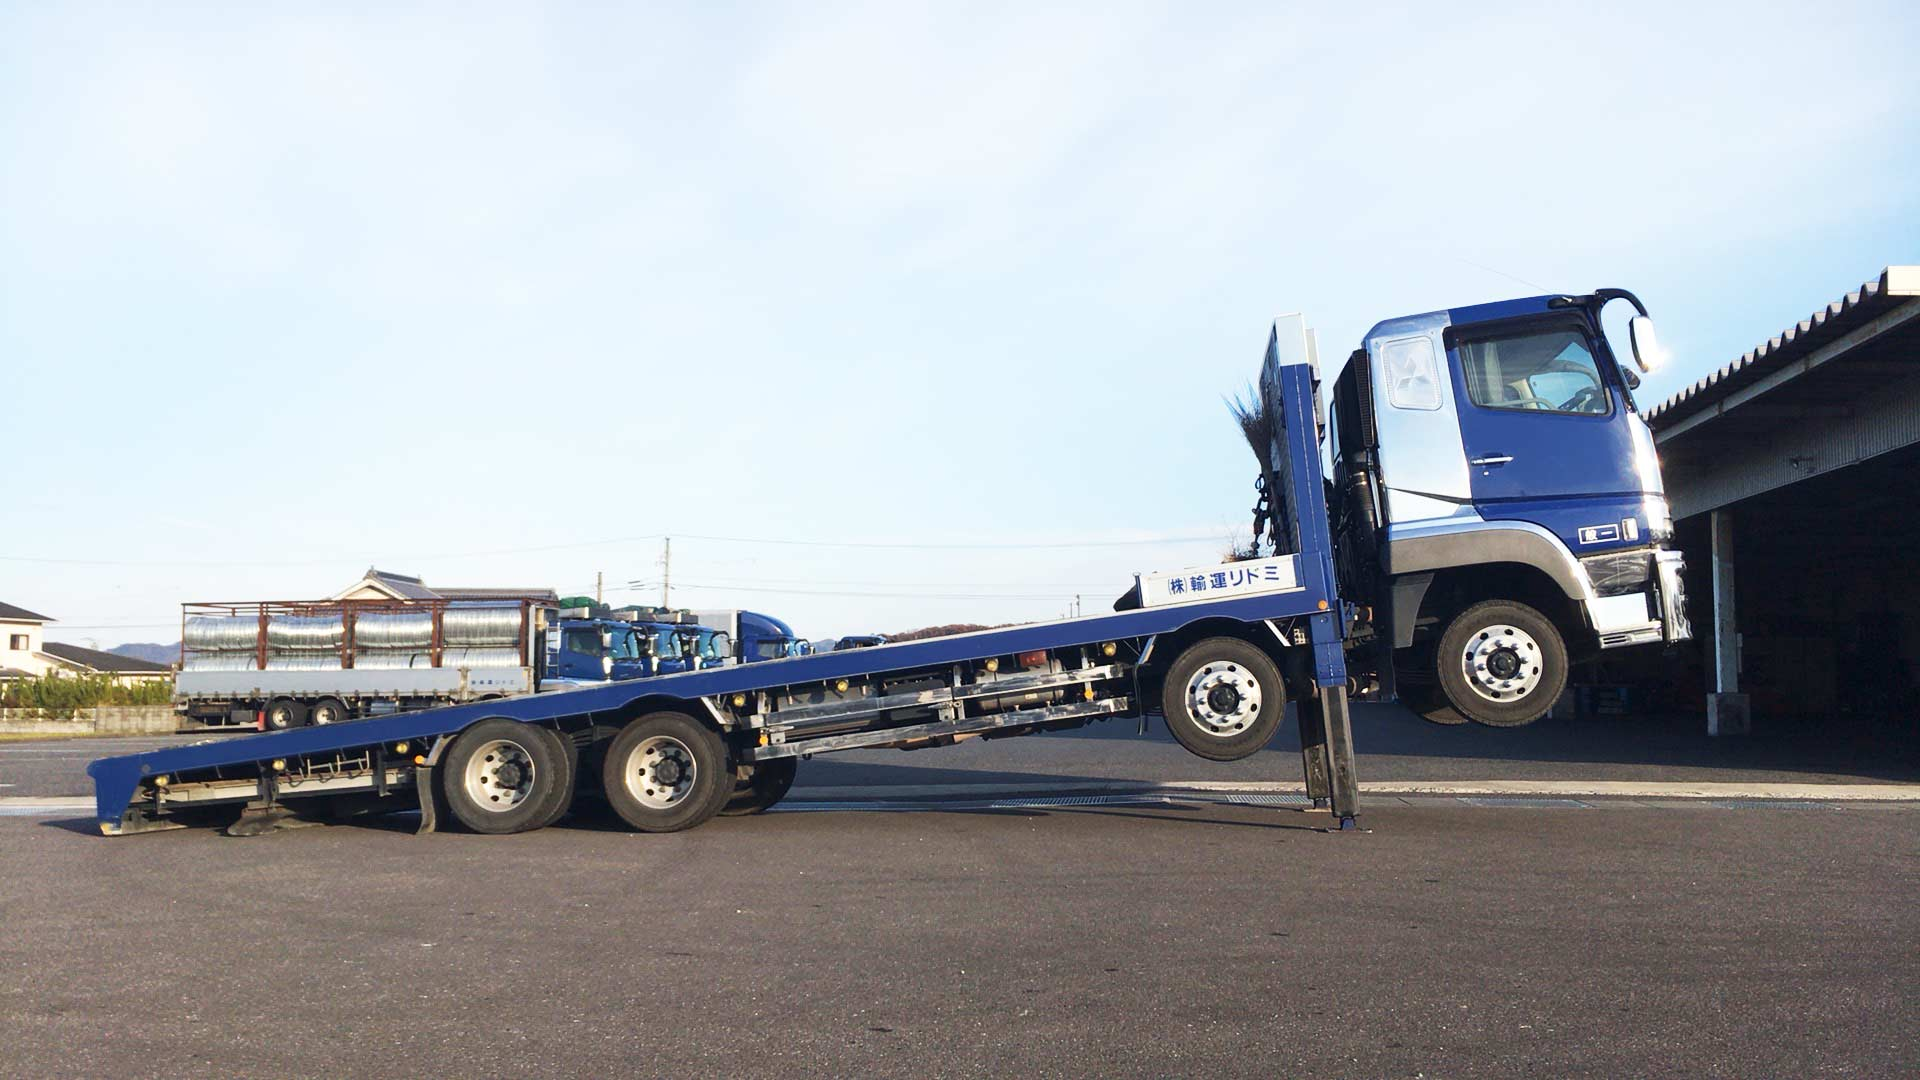 大型・中型トラック ( 平車 )4